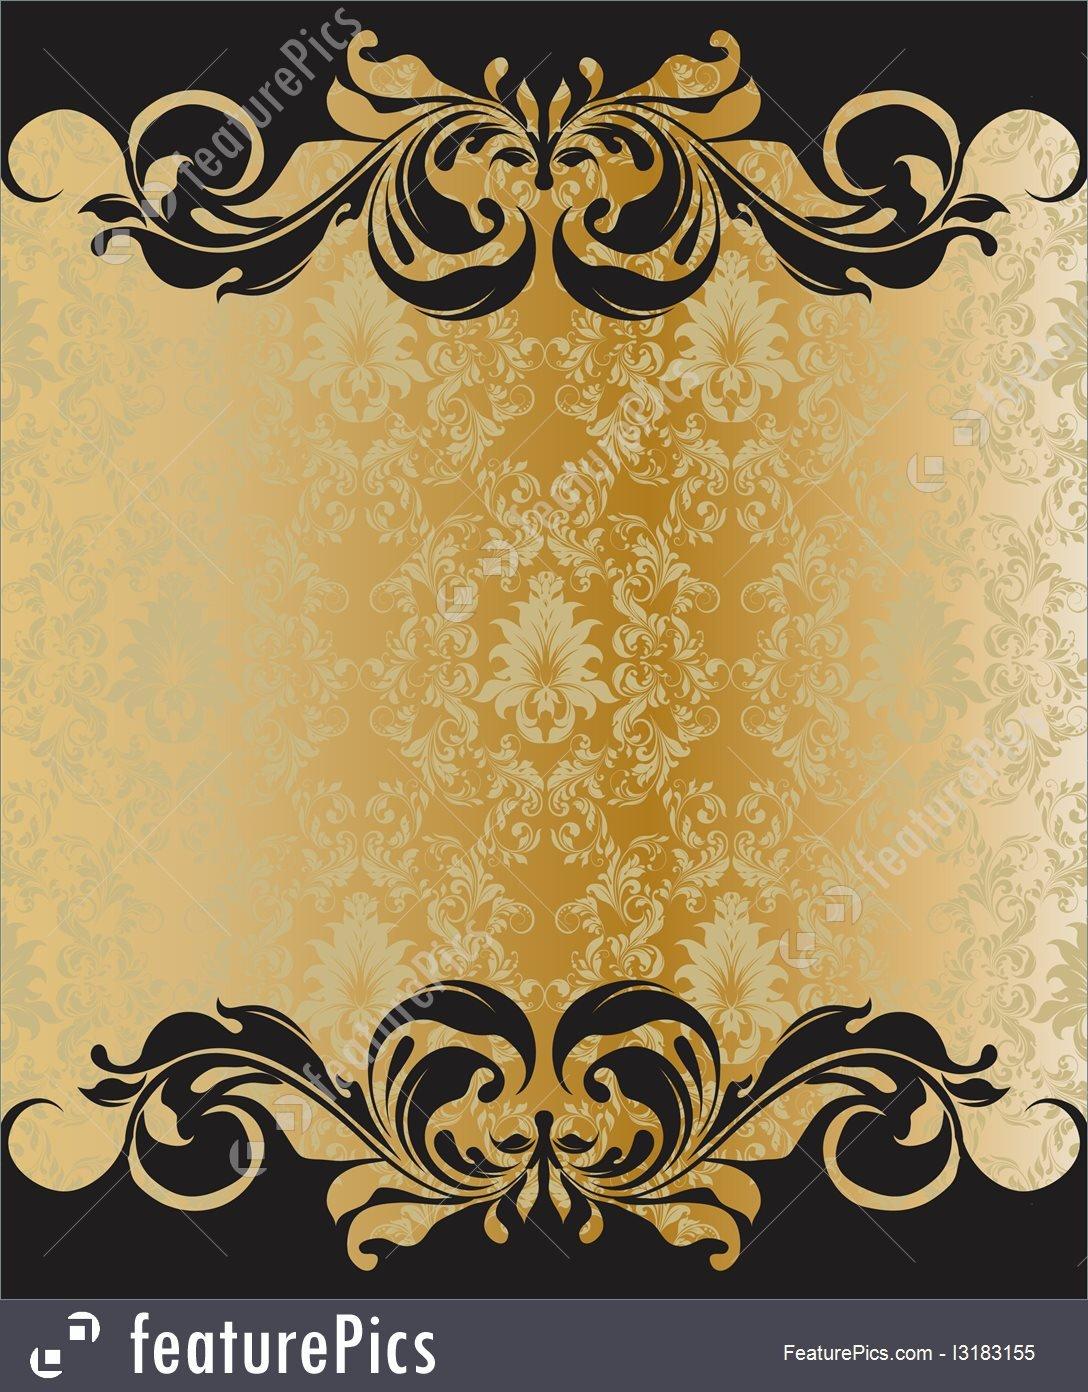 Free Printable Elegant Stationery Templates Templates Elegant Vintage Invitation Template Stock